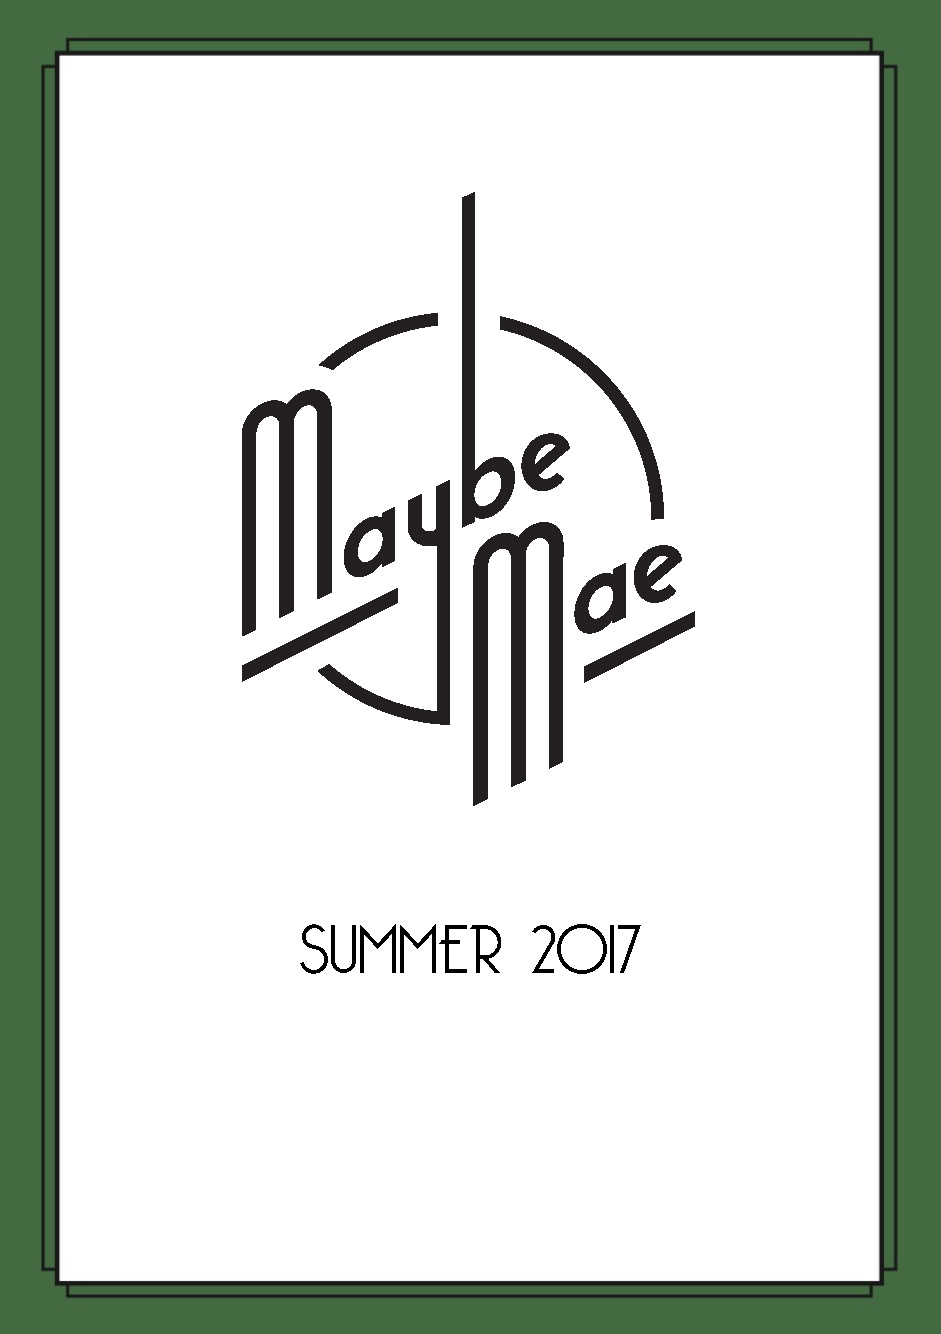 maybe-mae-menu-summer-2017-41_page_1